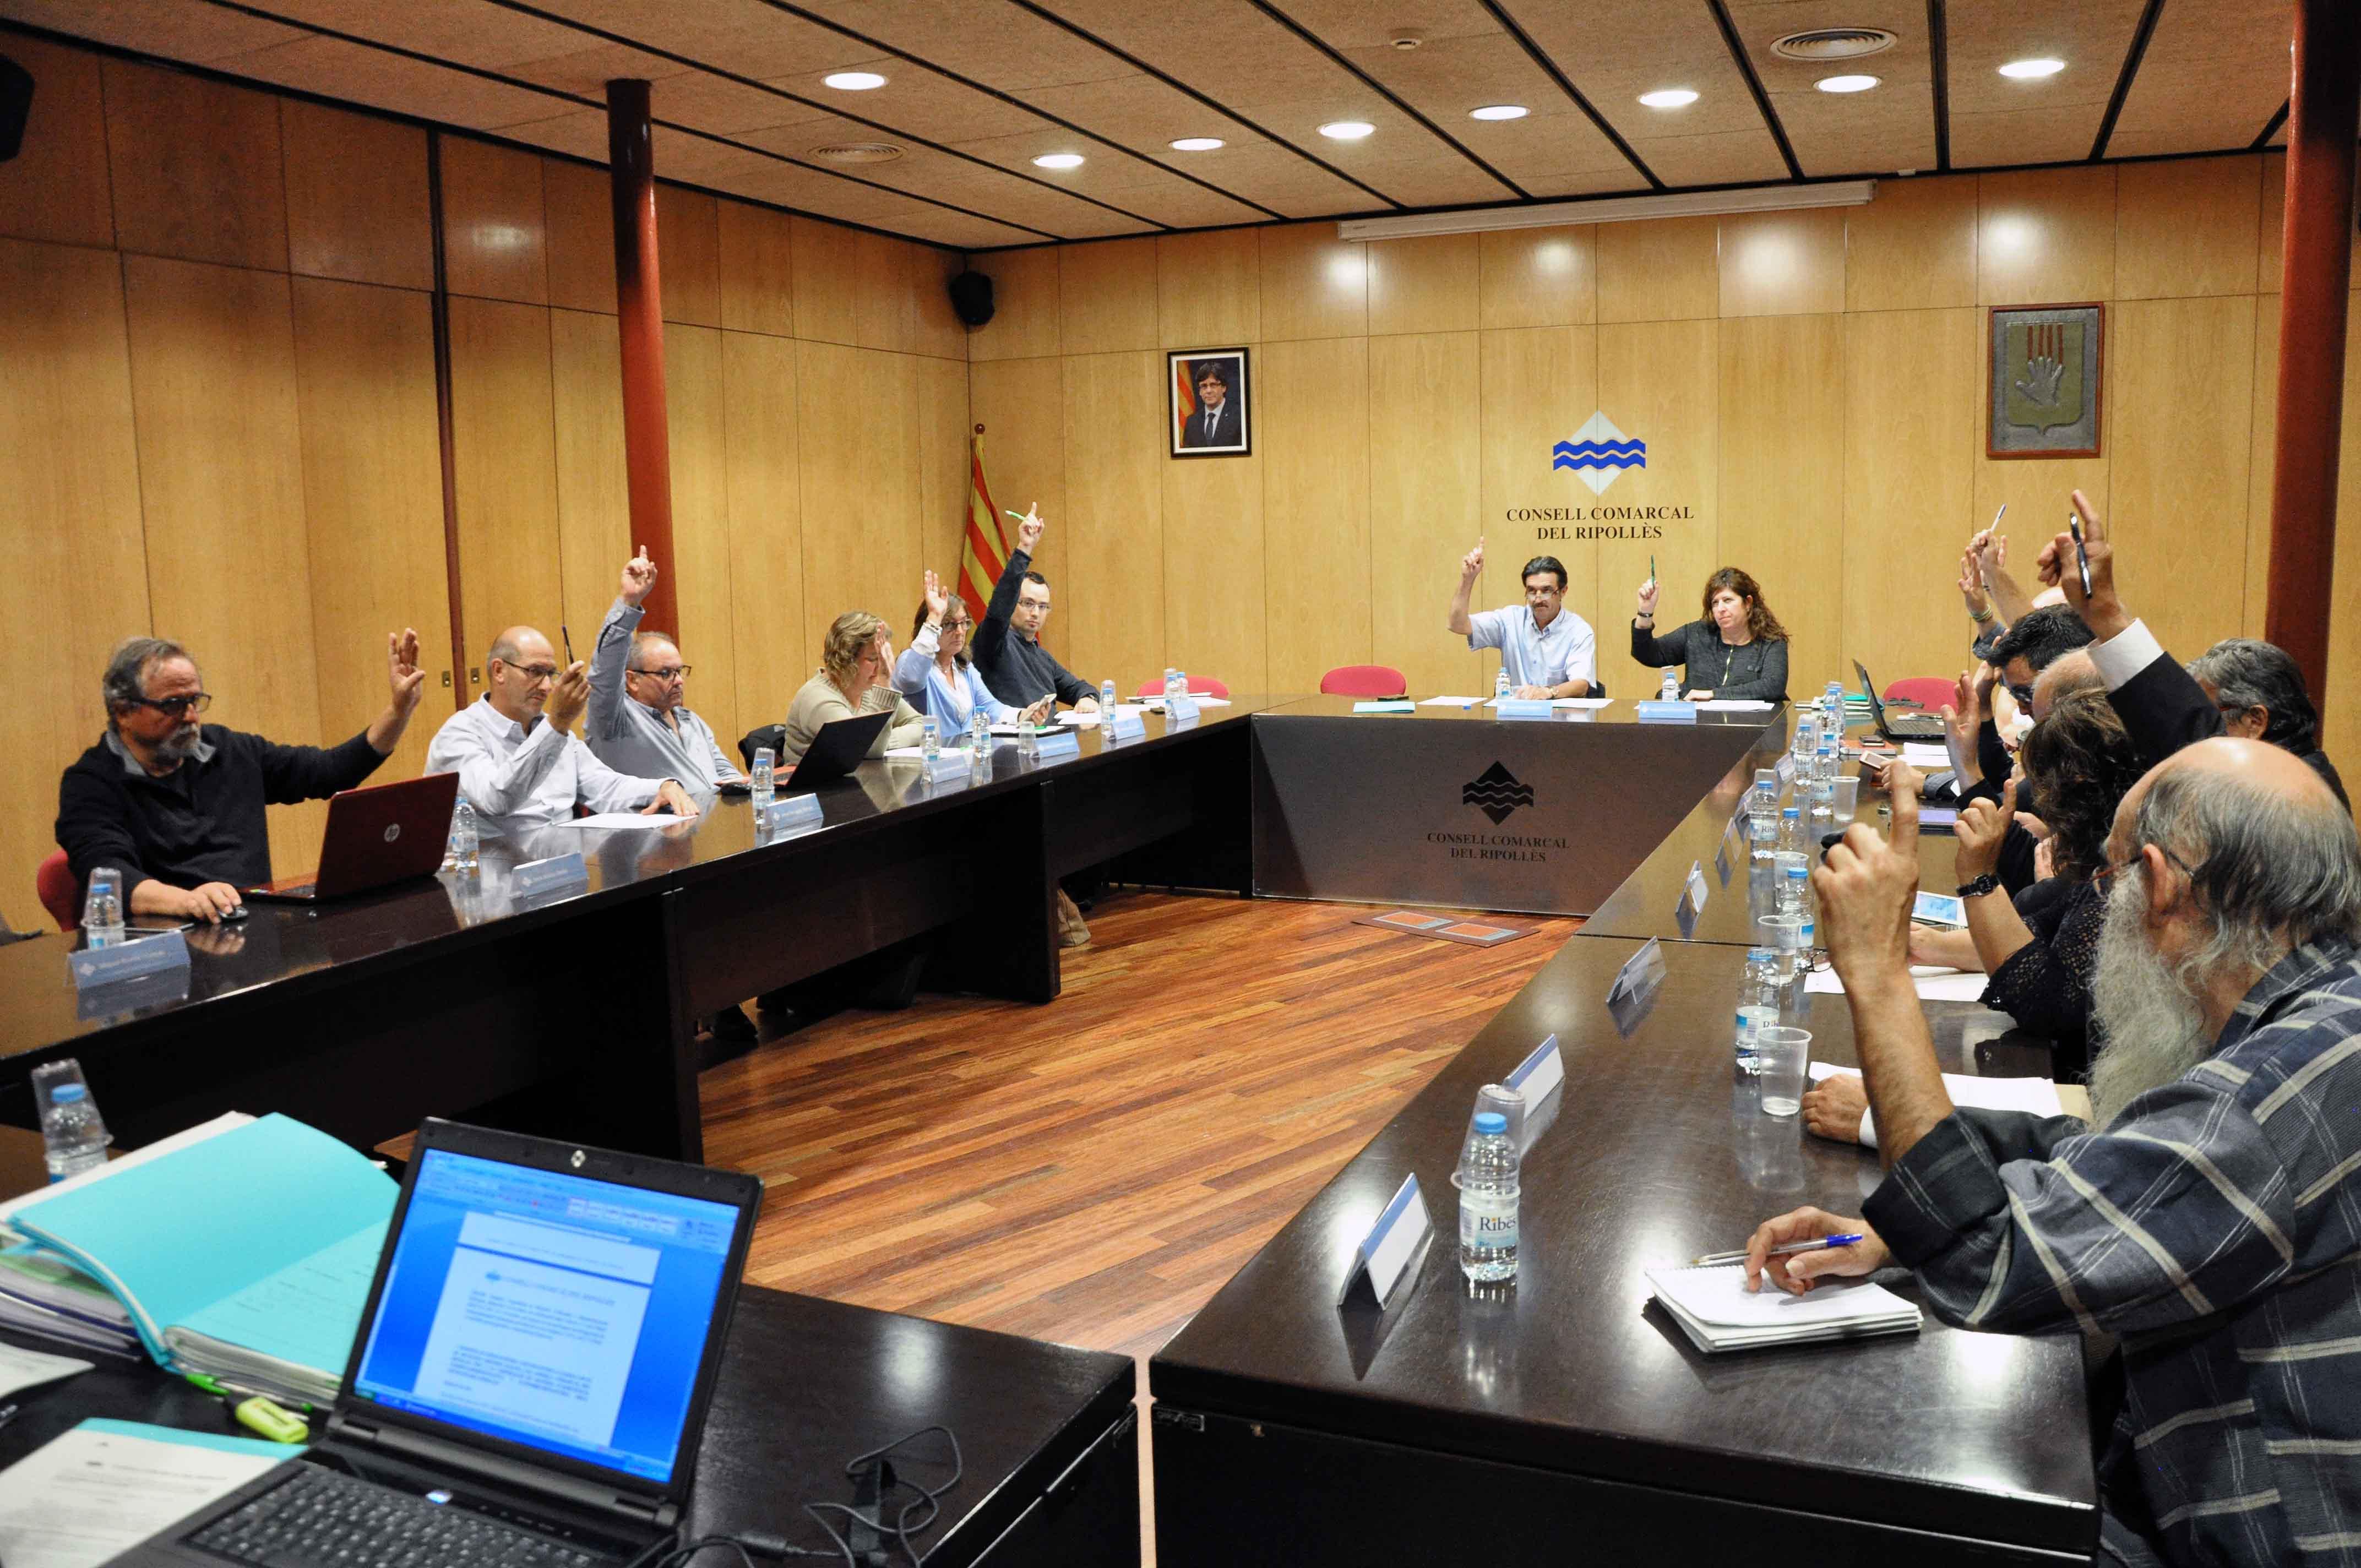 Ple ordinari del Consell Comarcal del Ripollès. 19 de stembre del 2017.